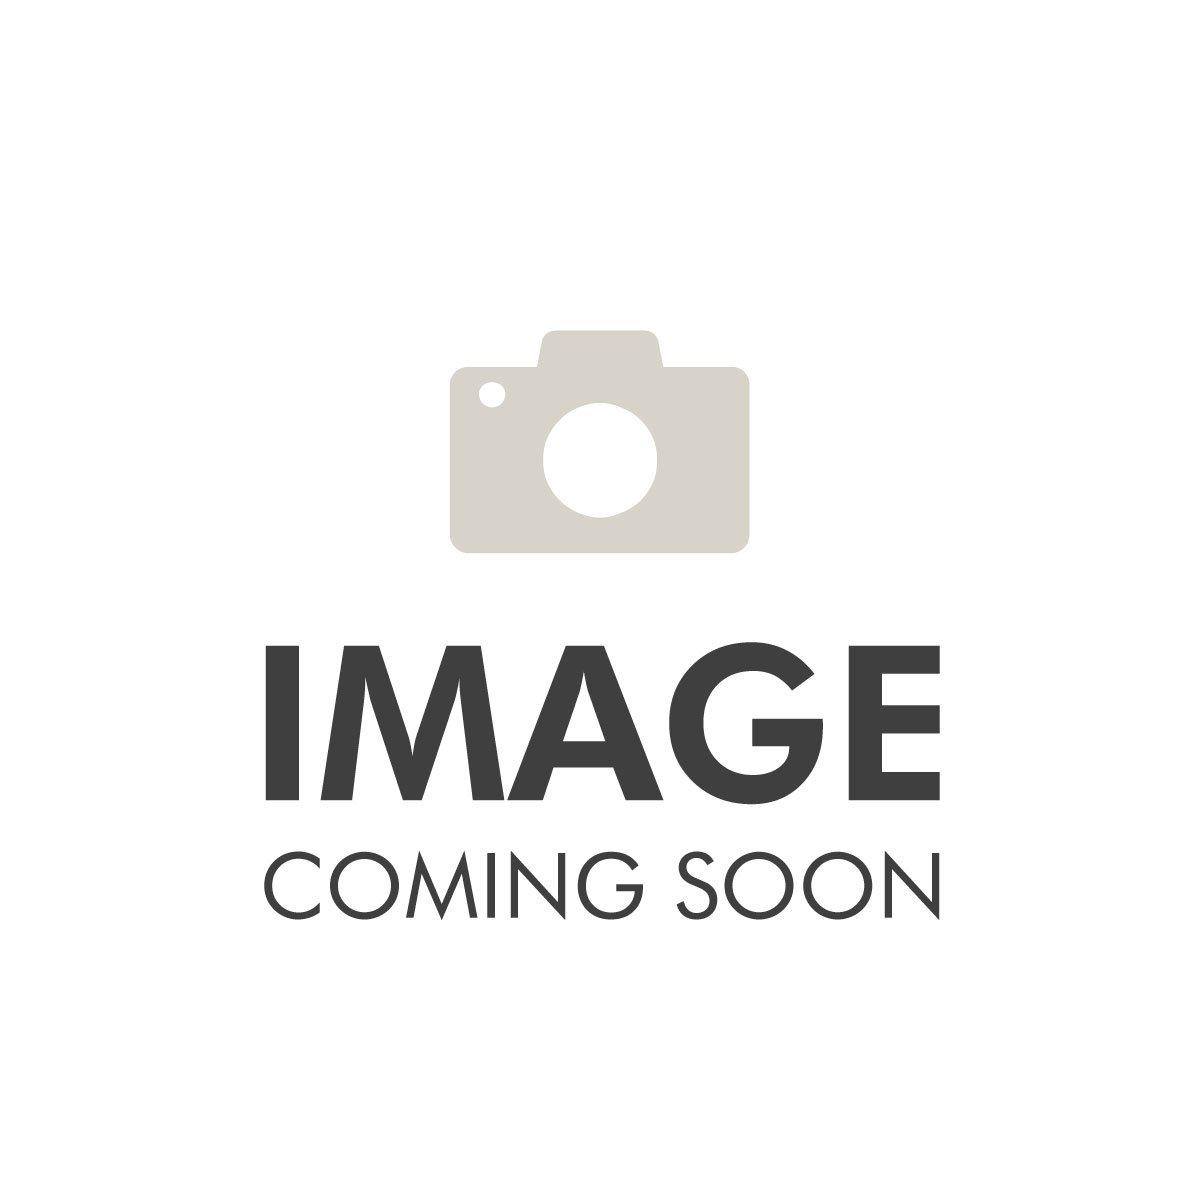 Uhlmann - Veste de fleuret - Inox - Femme